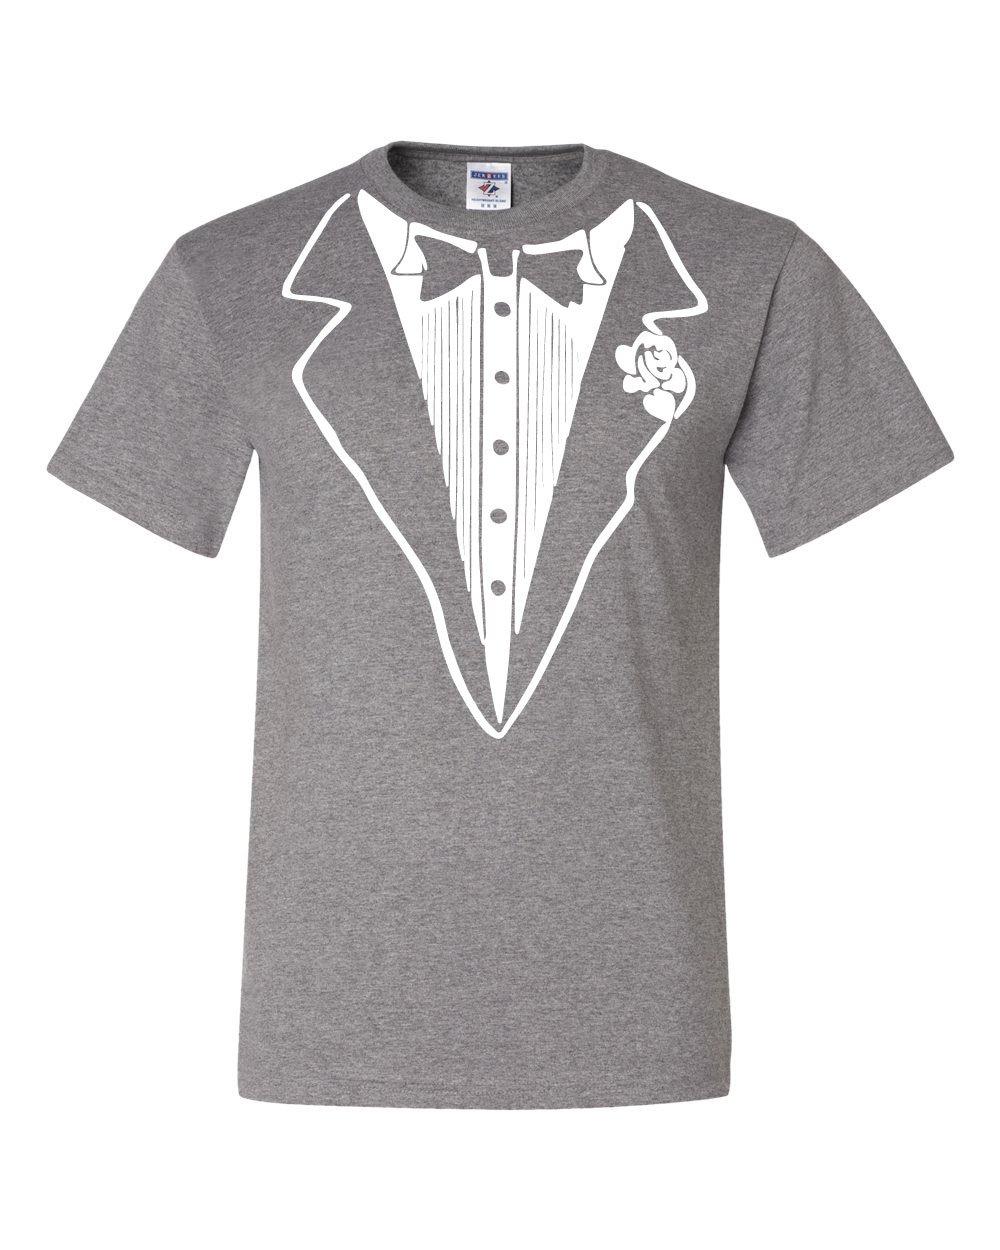 Tuxedo Funny T-Shirt Tux Bachelor Party Wedding Groom Tee Shirt Gray M